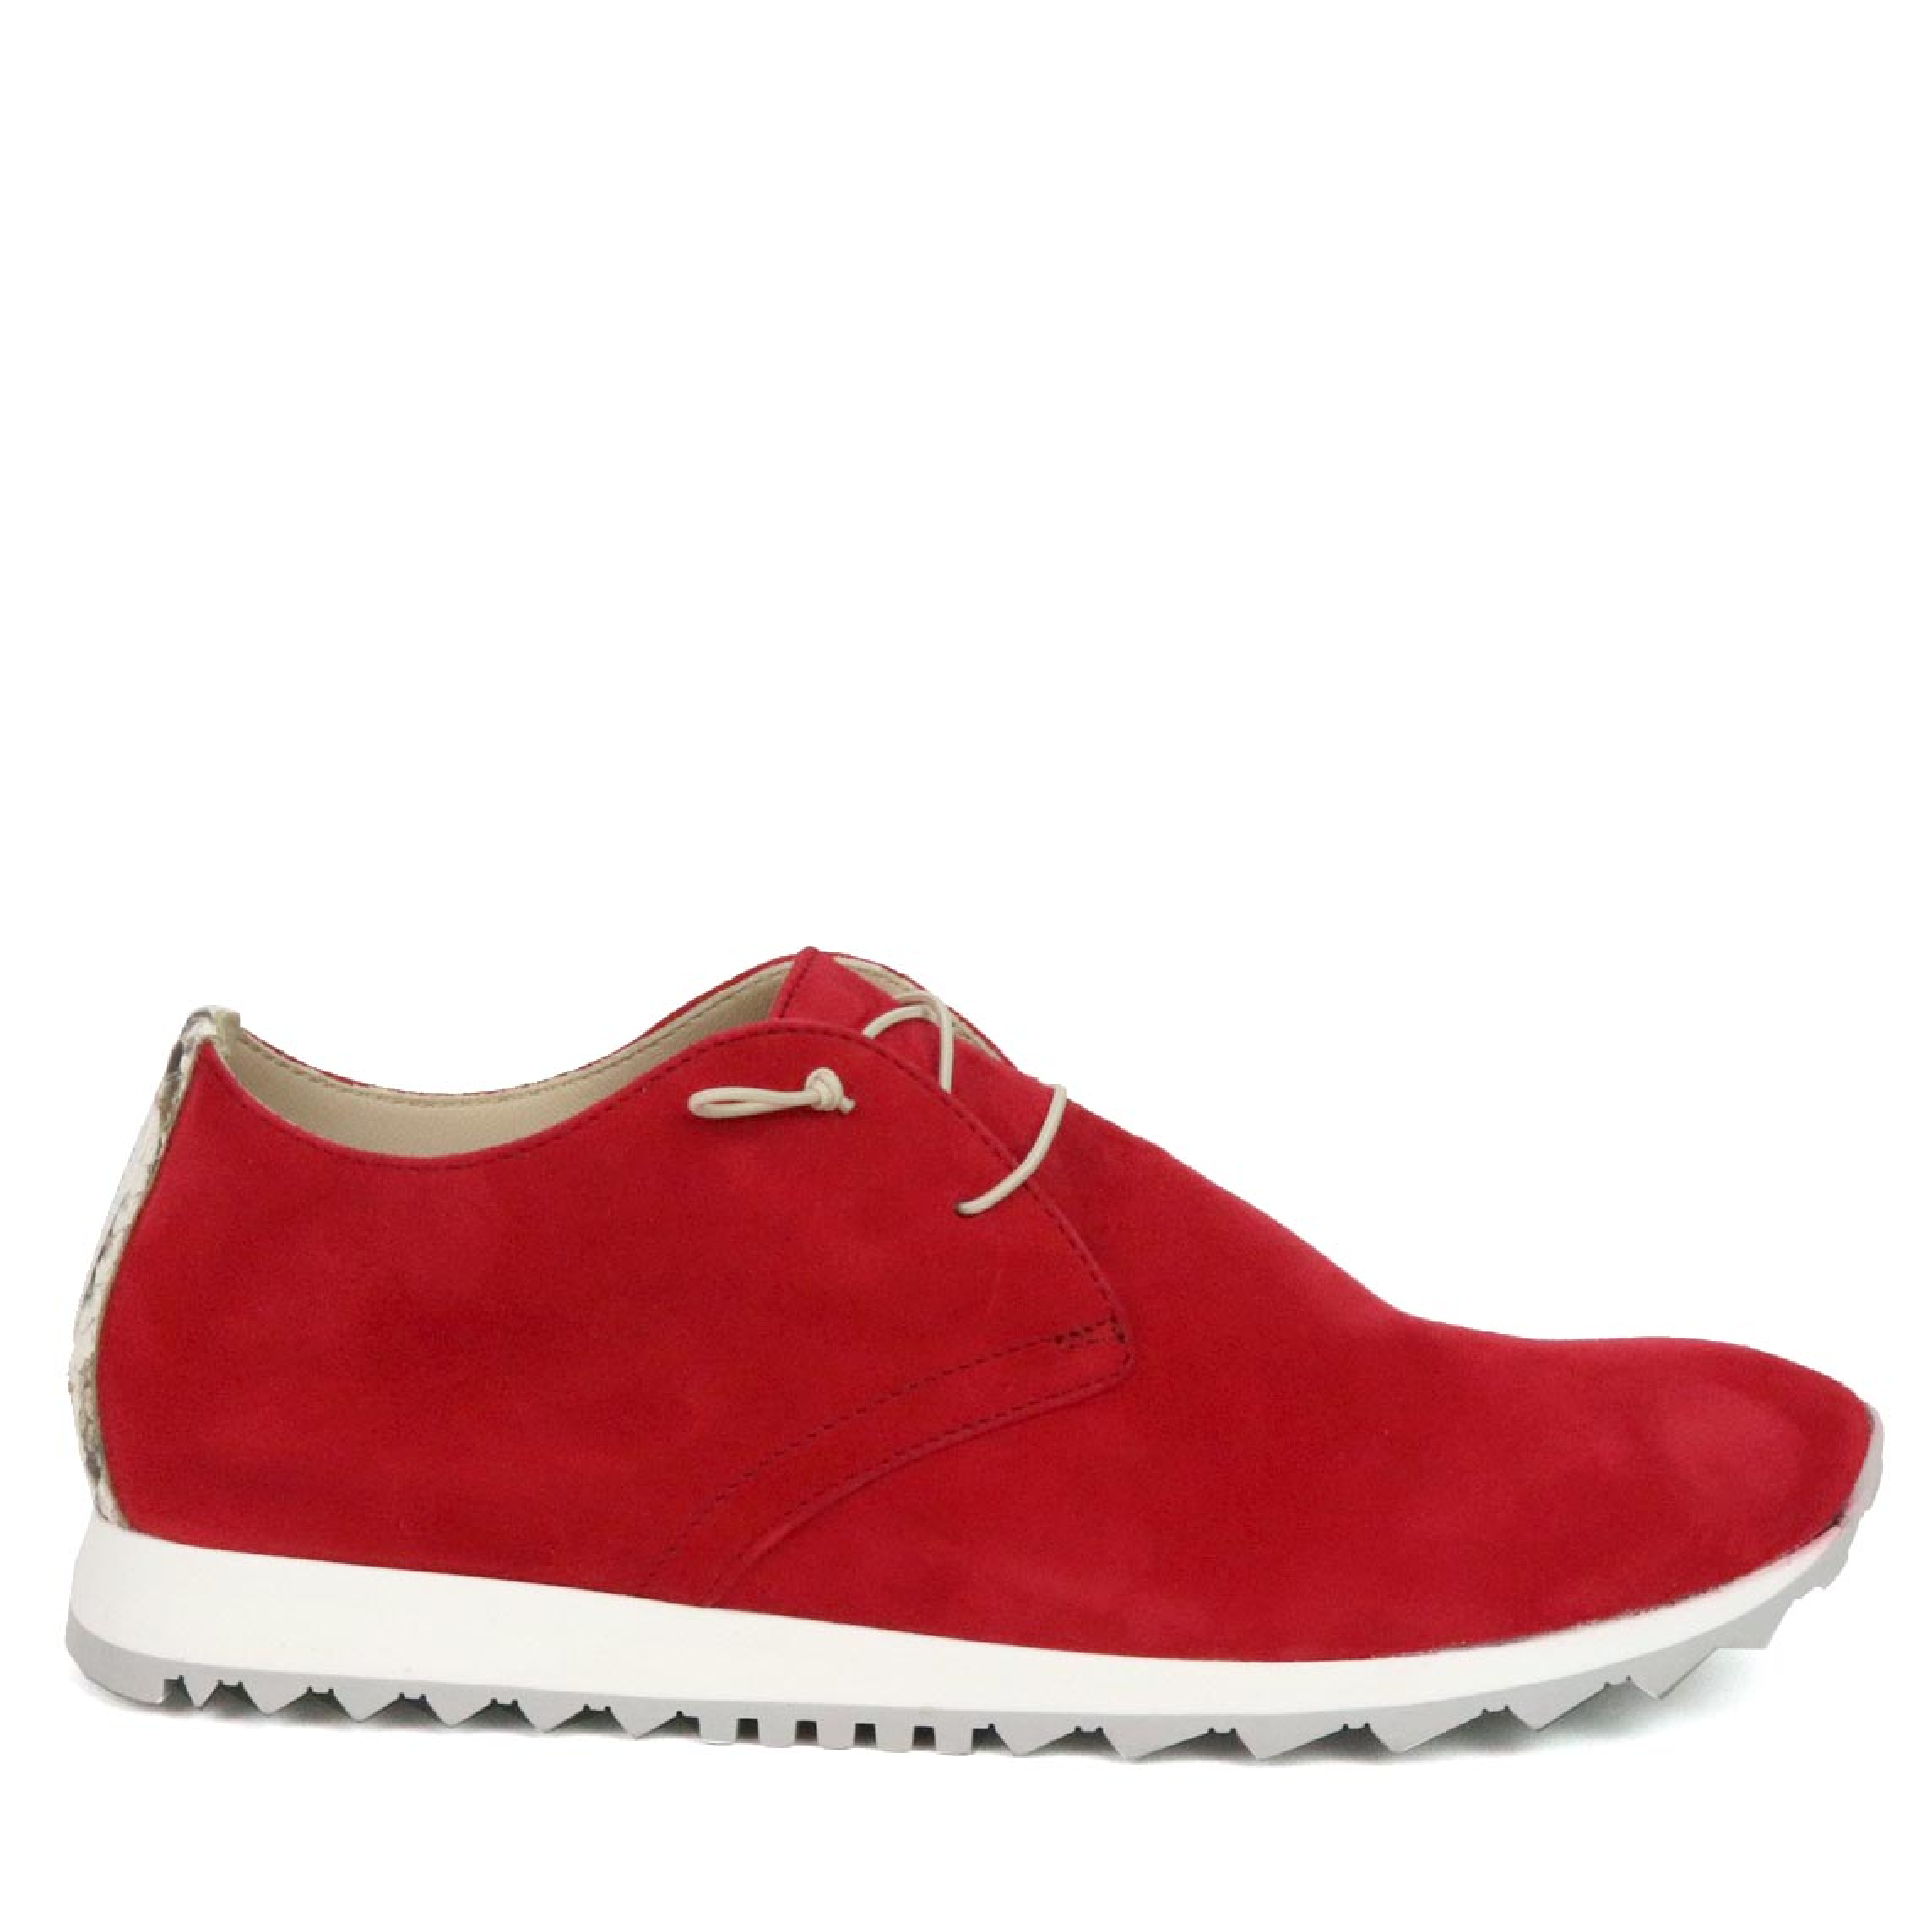 Donna Carolina schoenen | Waardijk schoenen